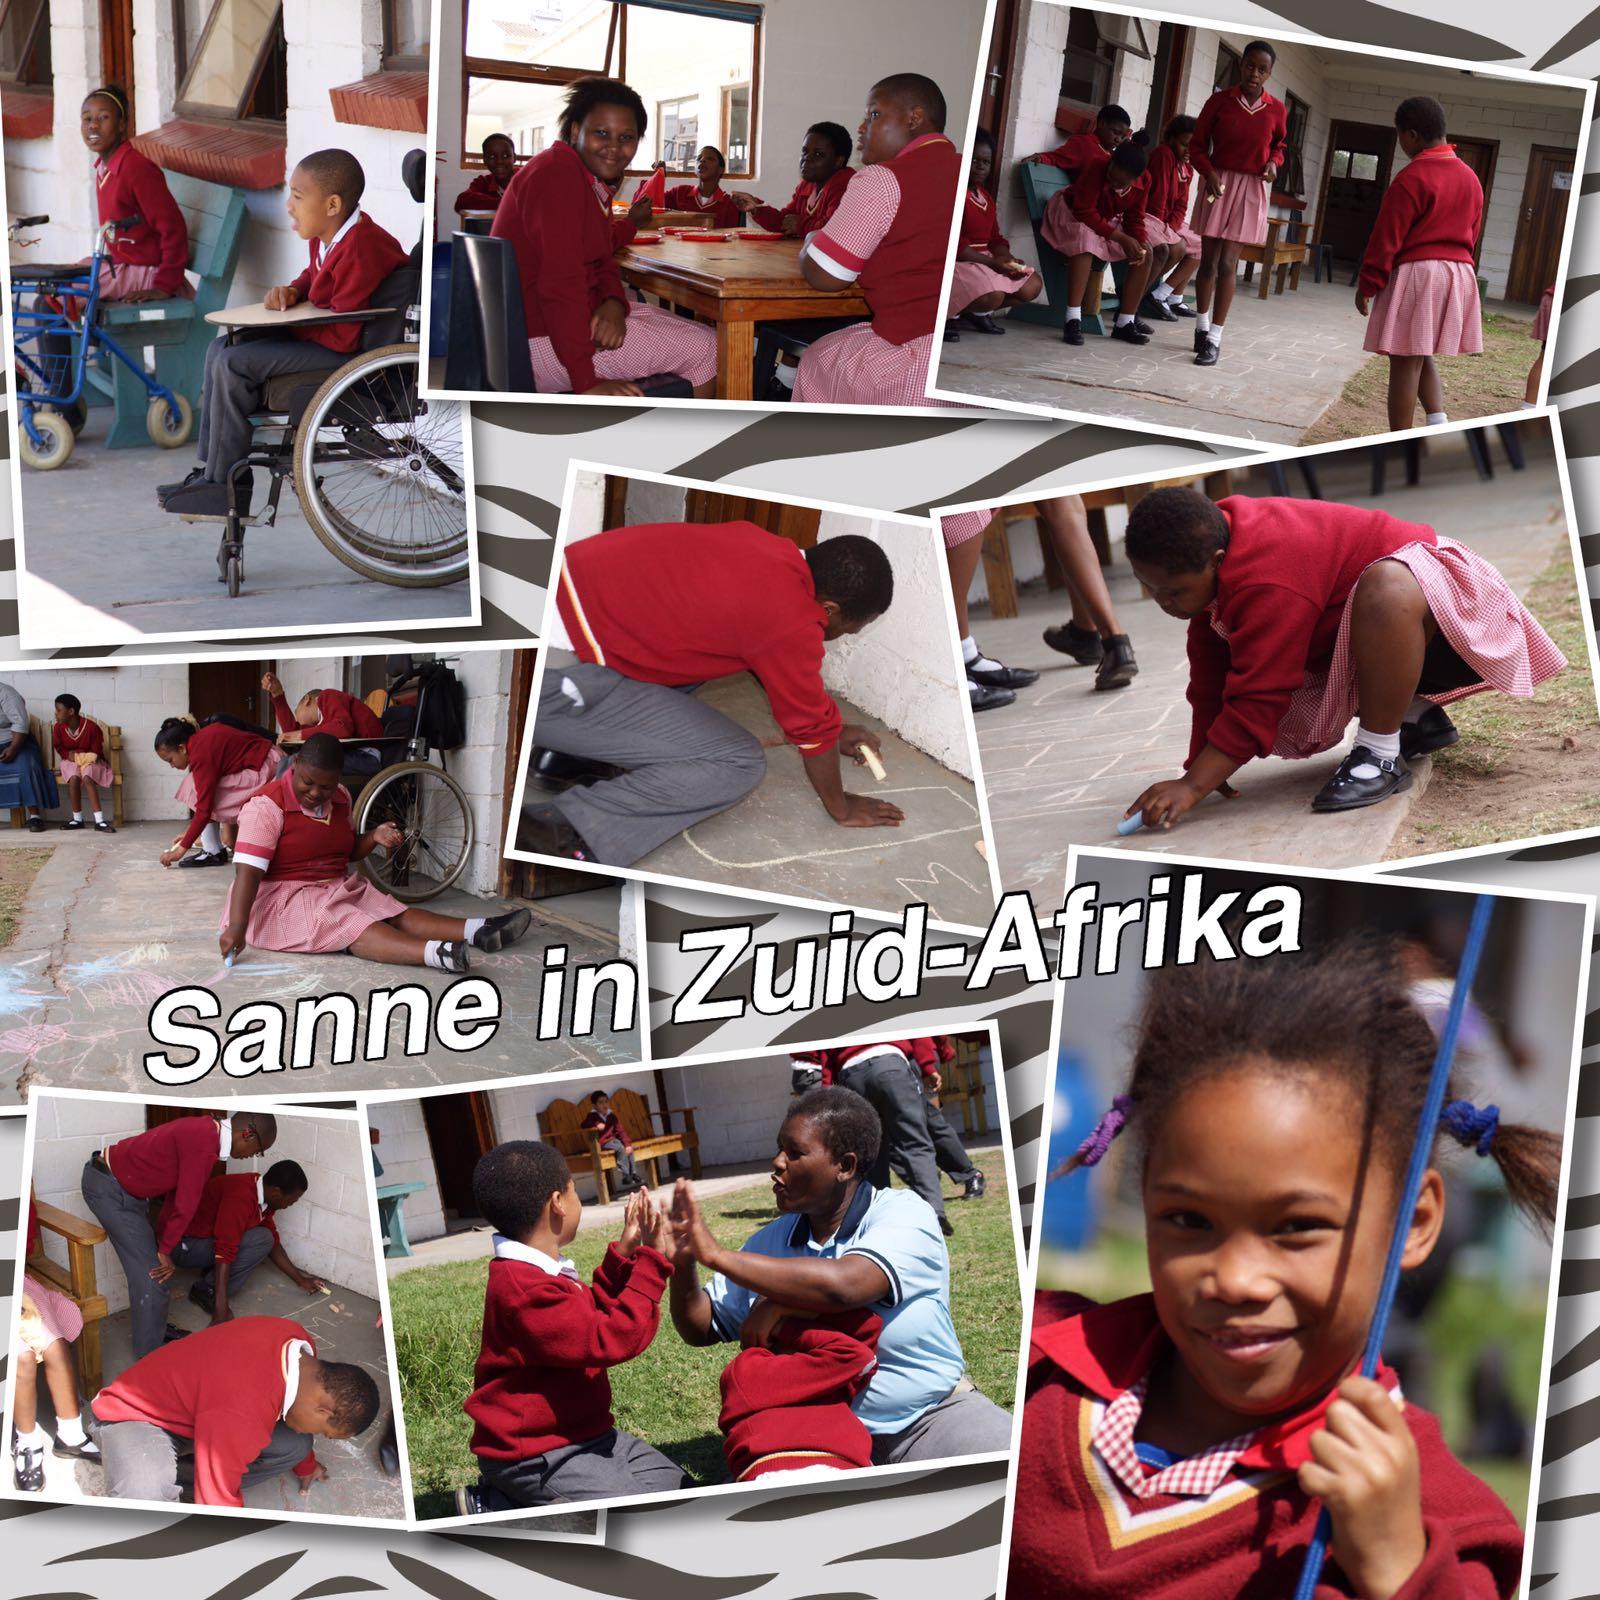 Sanne z afrika